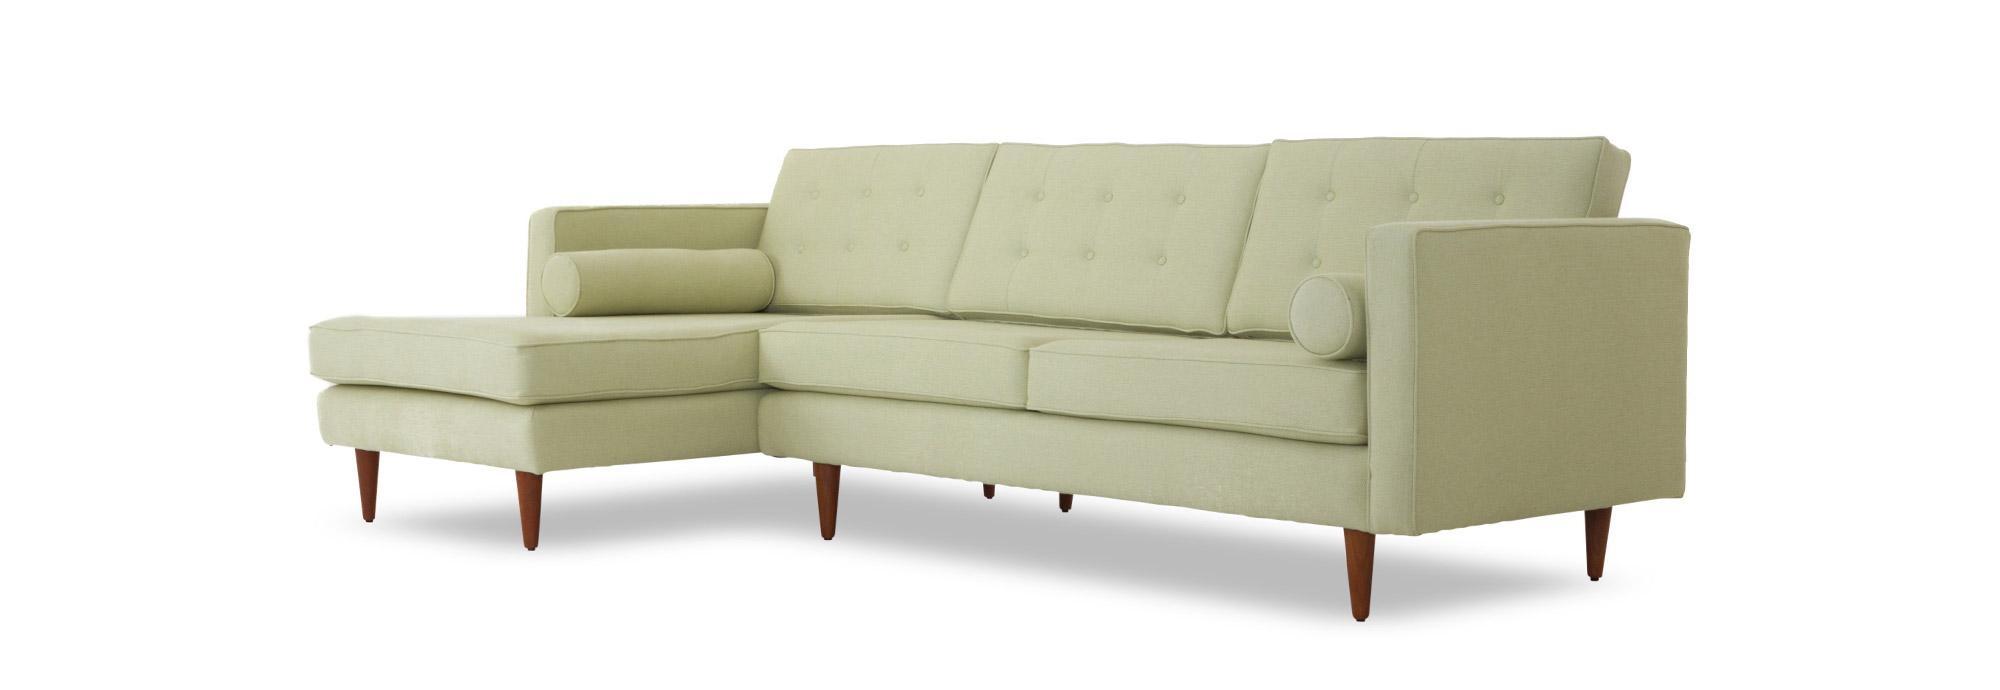 Braxton Sectional | Joybird Throughout Braxton Sectional Sofas (View 6 of 20)